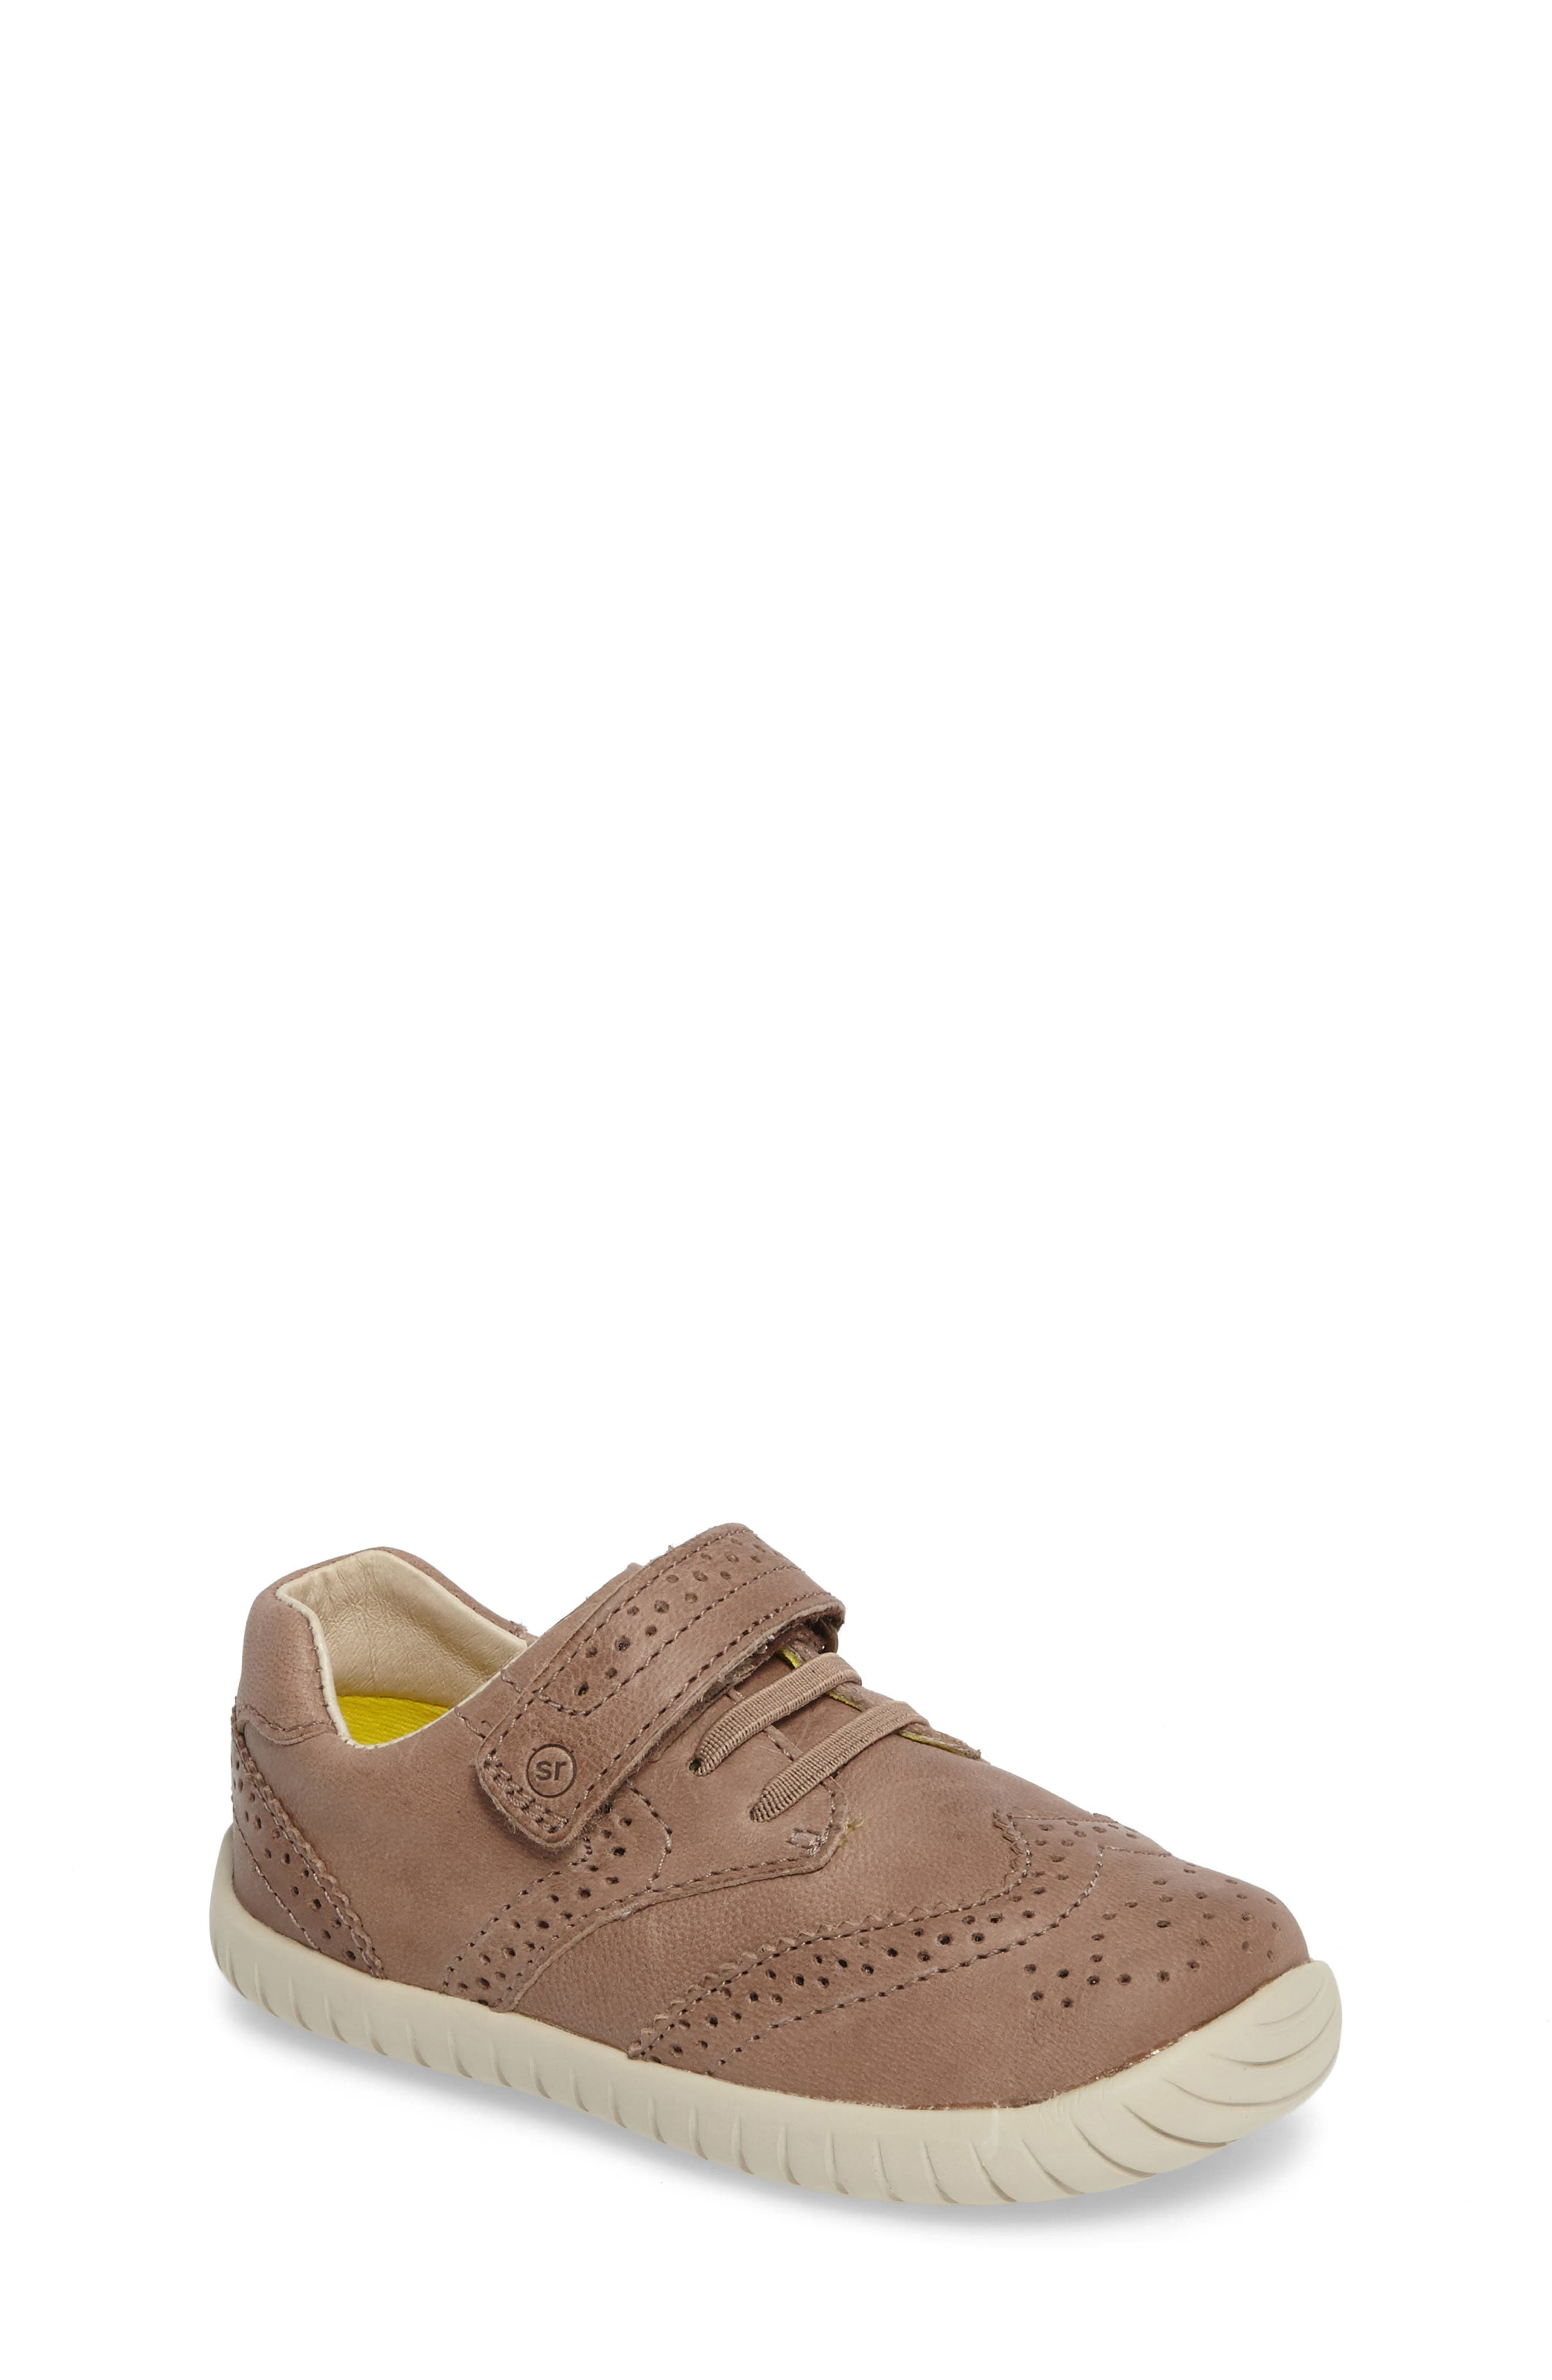 Stride Rite Addison Wingtip Sneaker (Baby, Walker & Toddler)